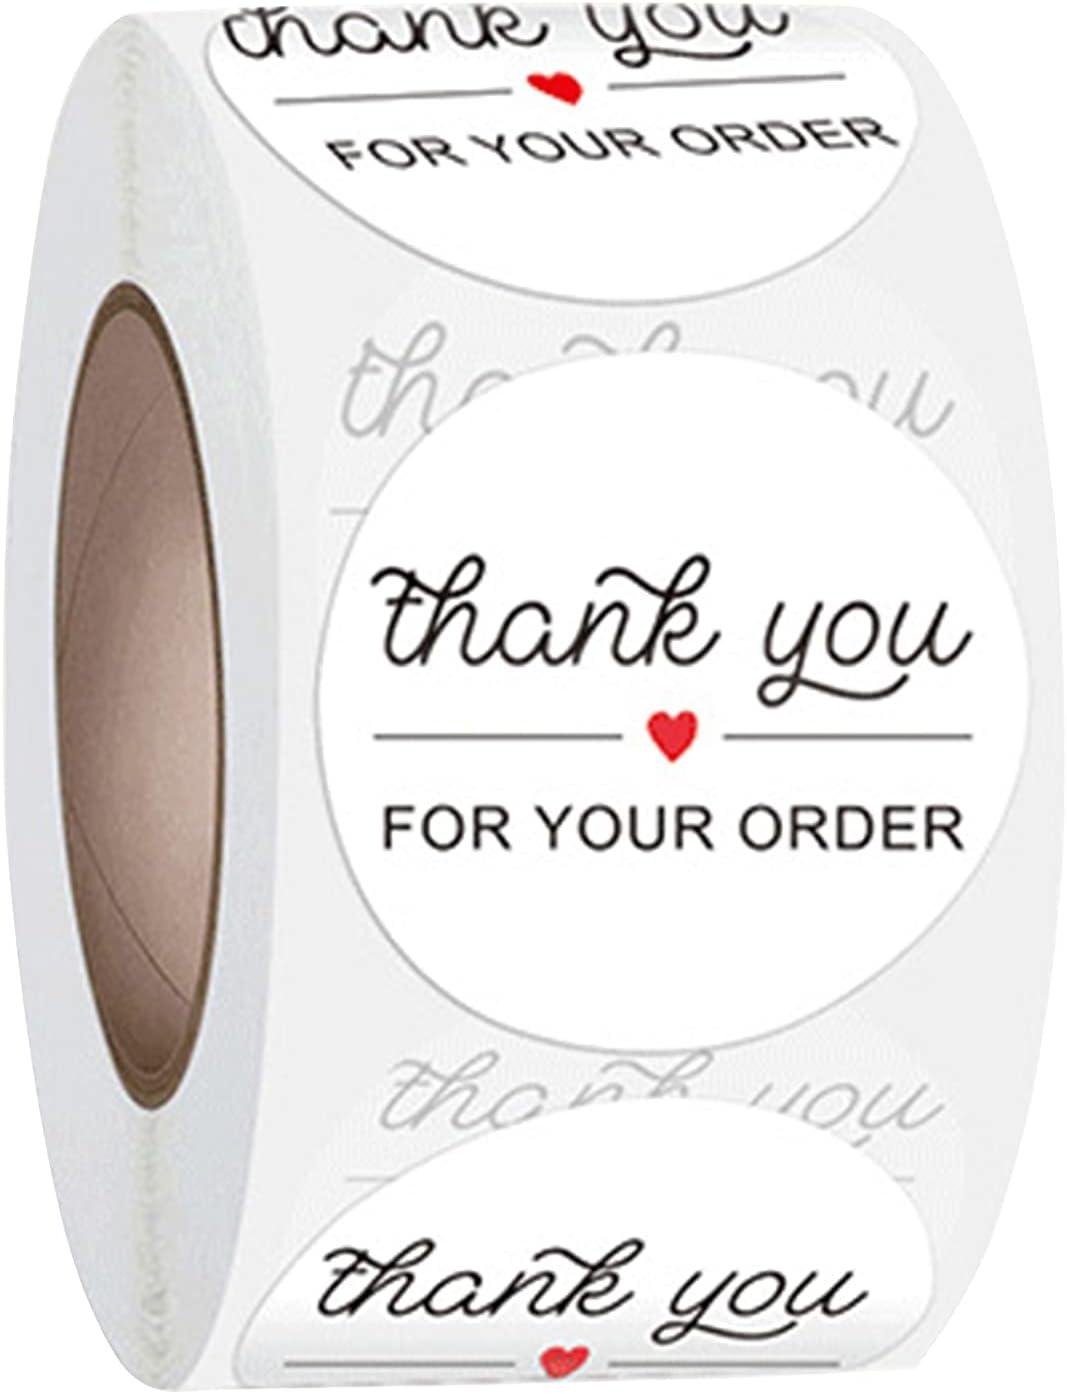 Sticker roll, Business Sticker, Envelope Sticker, Packaging Bag Sticker, Box Sticker, Sealing and Decorative Sticker Gift, 500 Labels per roll (White+Black)